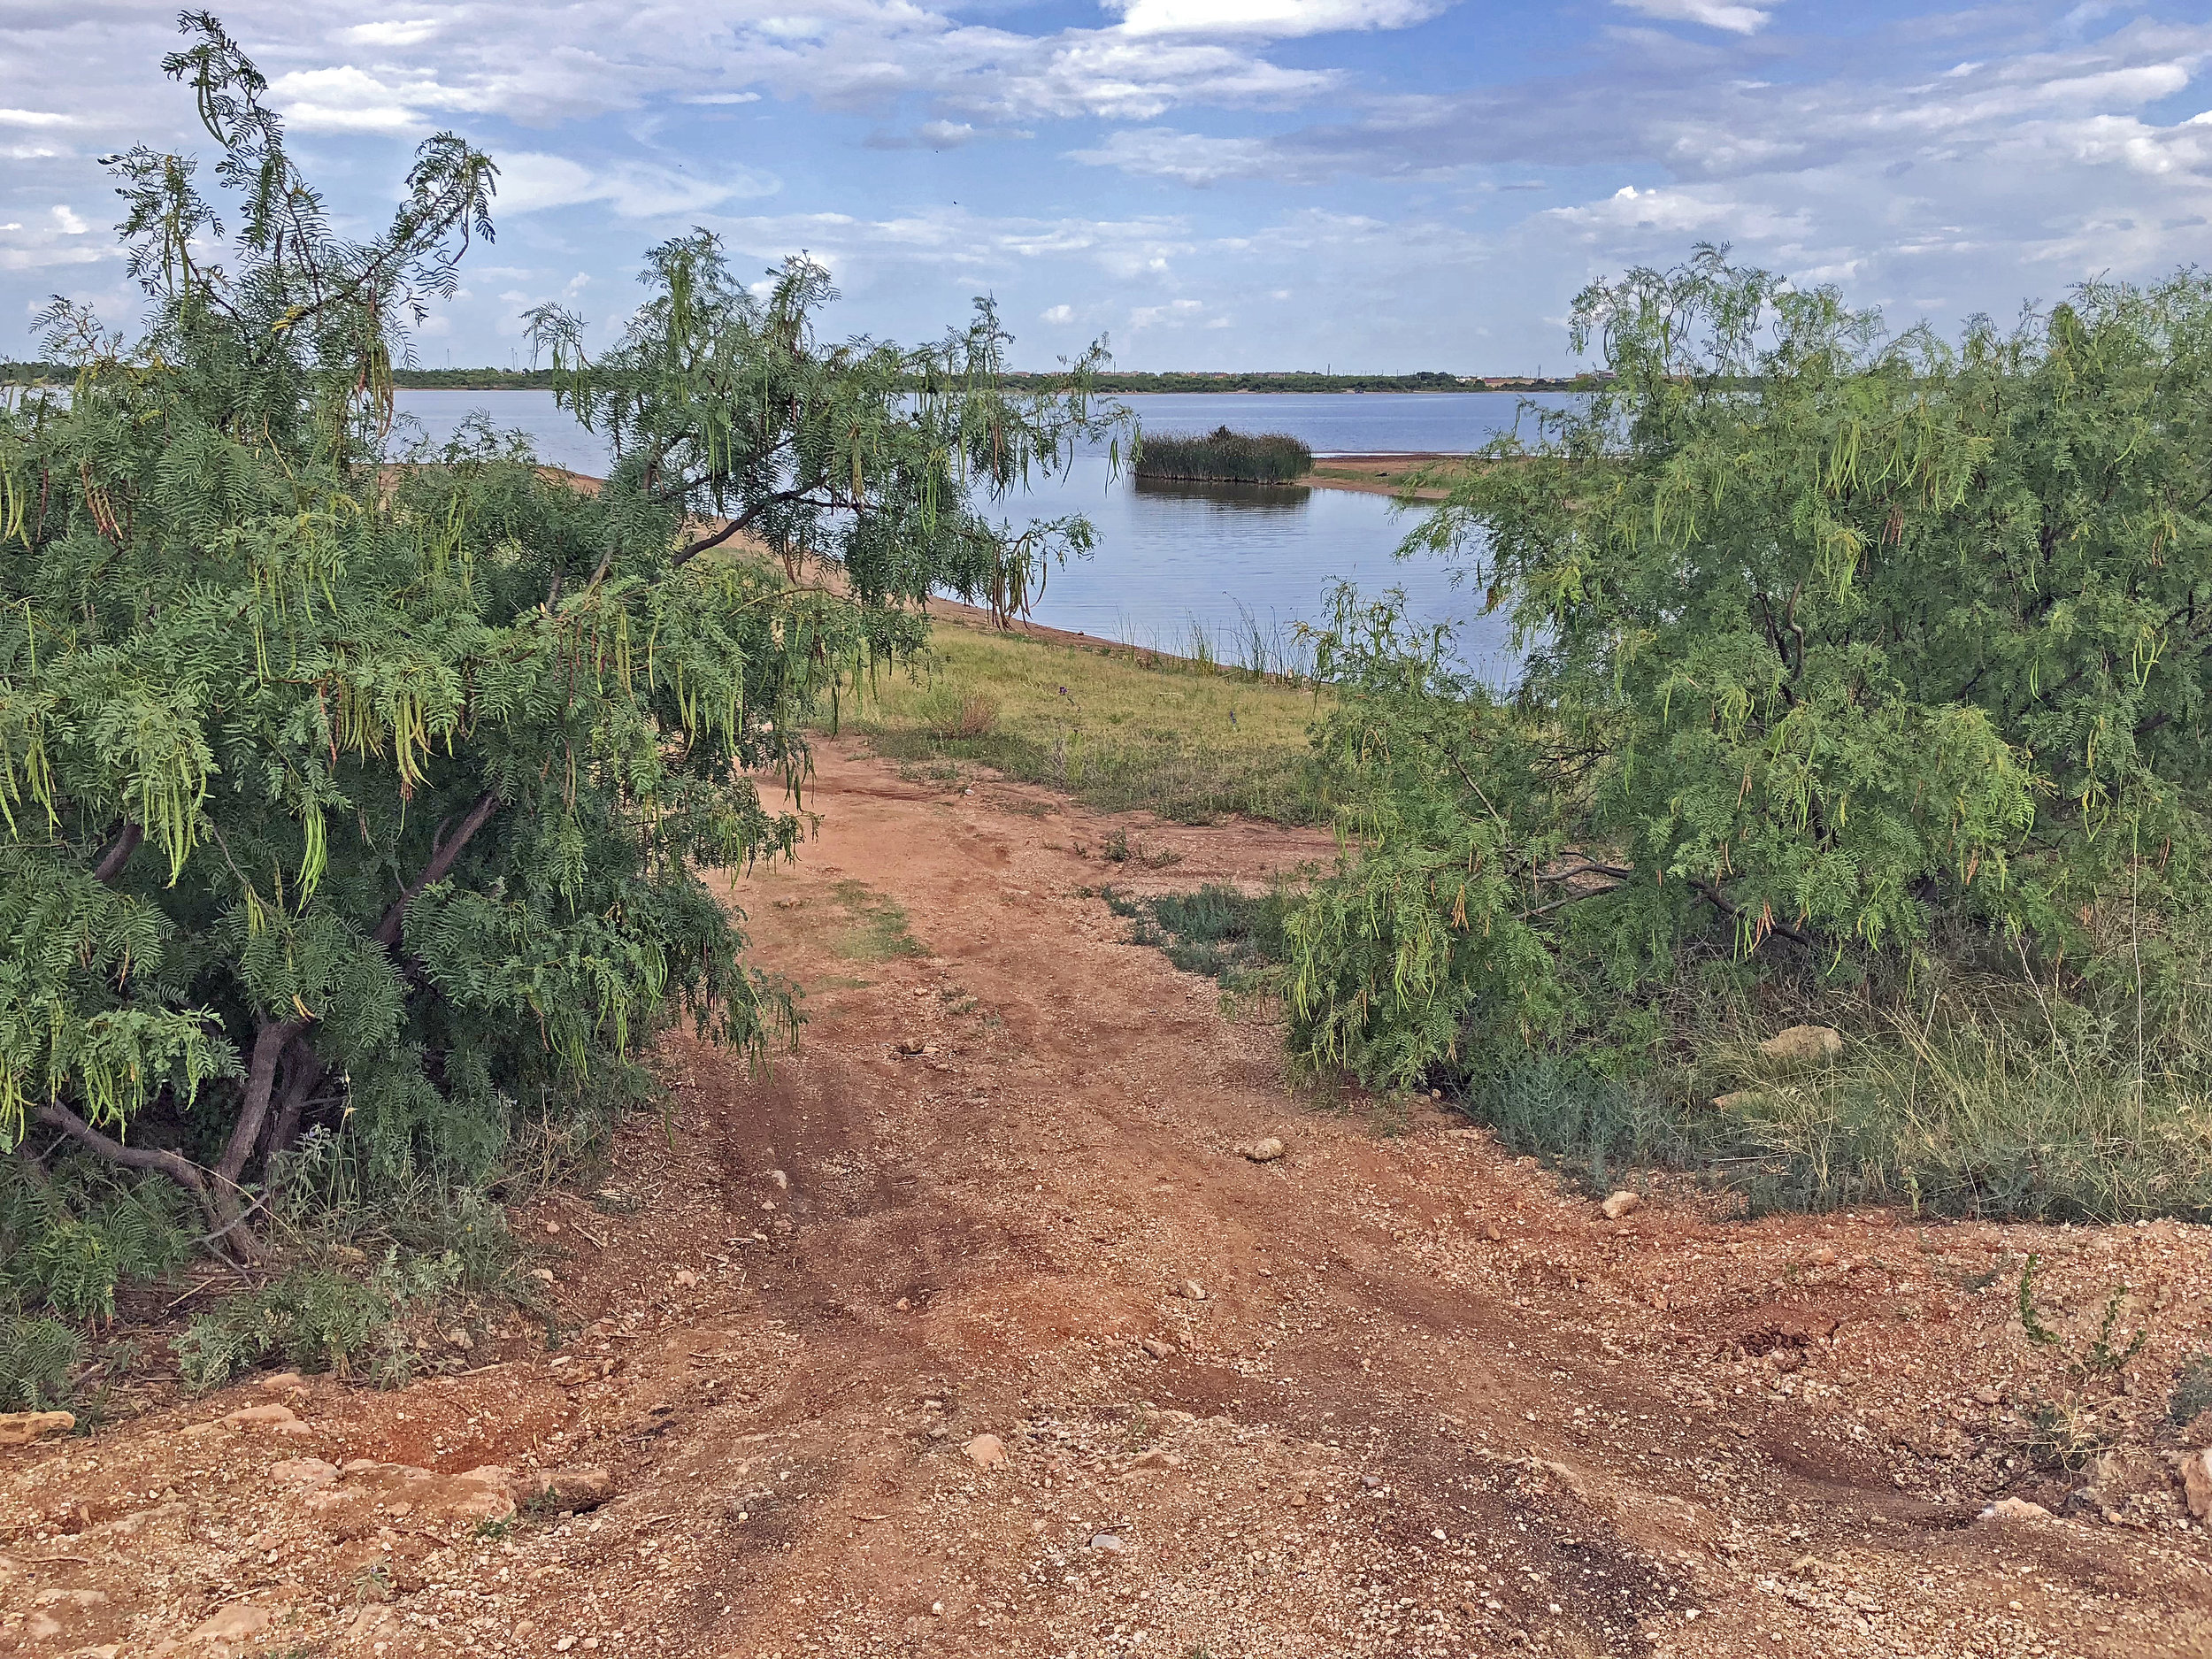 Kabar Kukri Clearing Tree Limbs